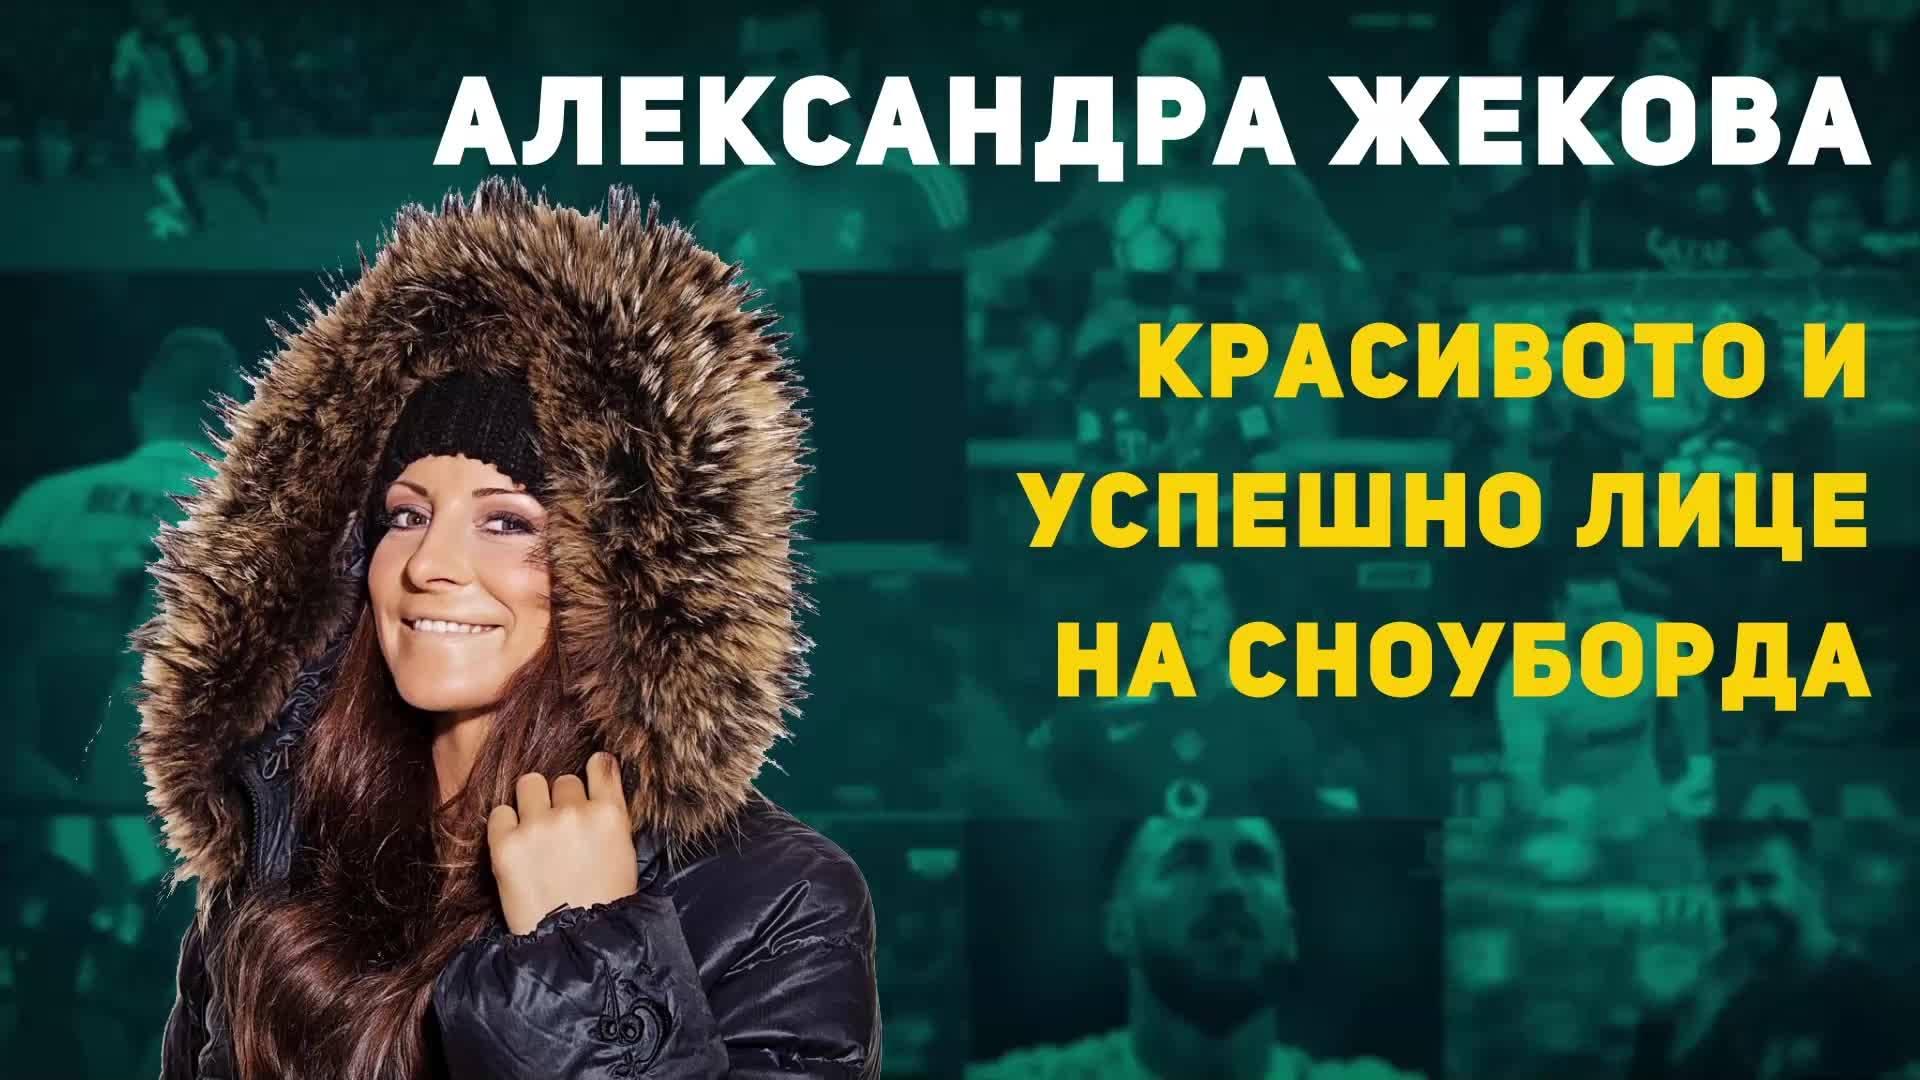 Александра Жекова - Красивото и успешно лице на сноуборда